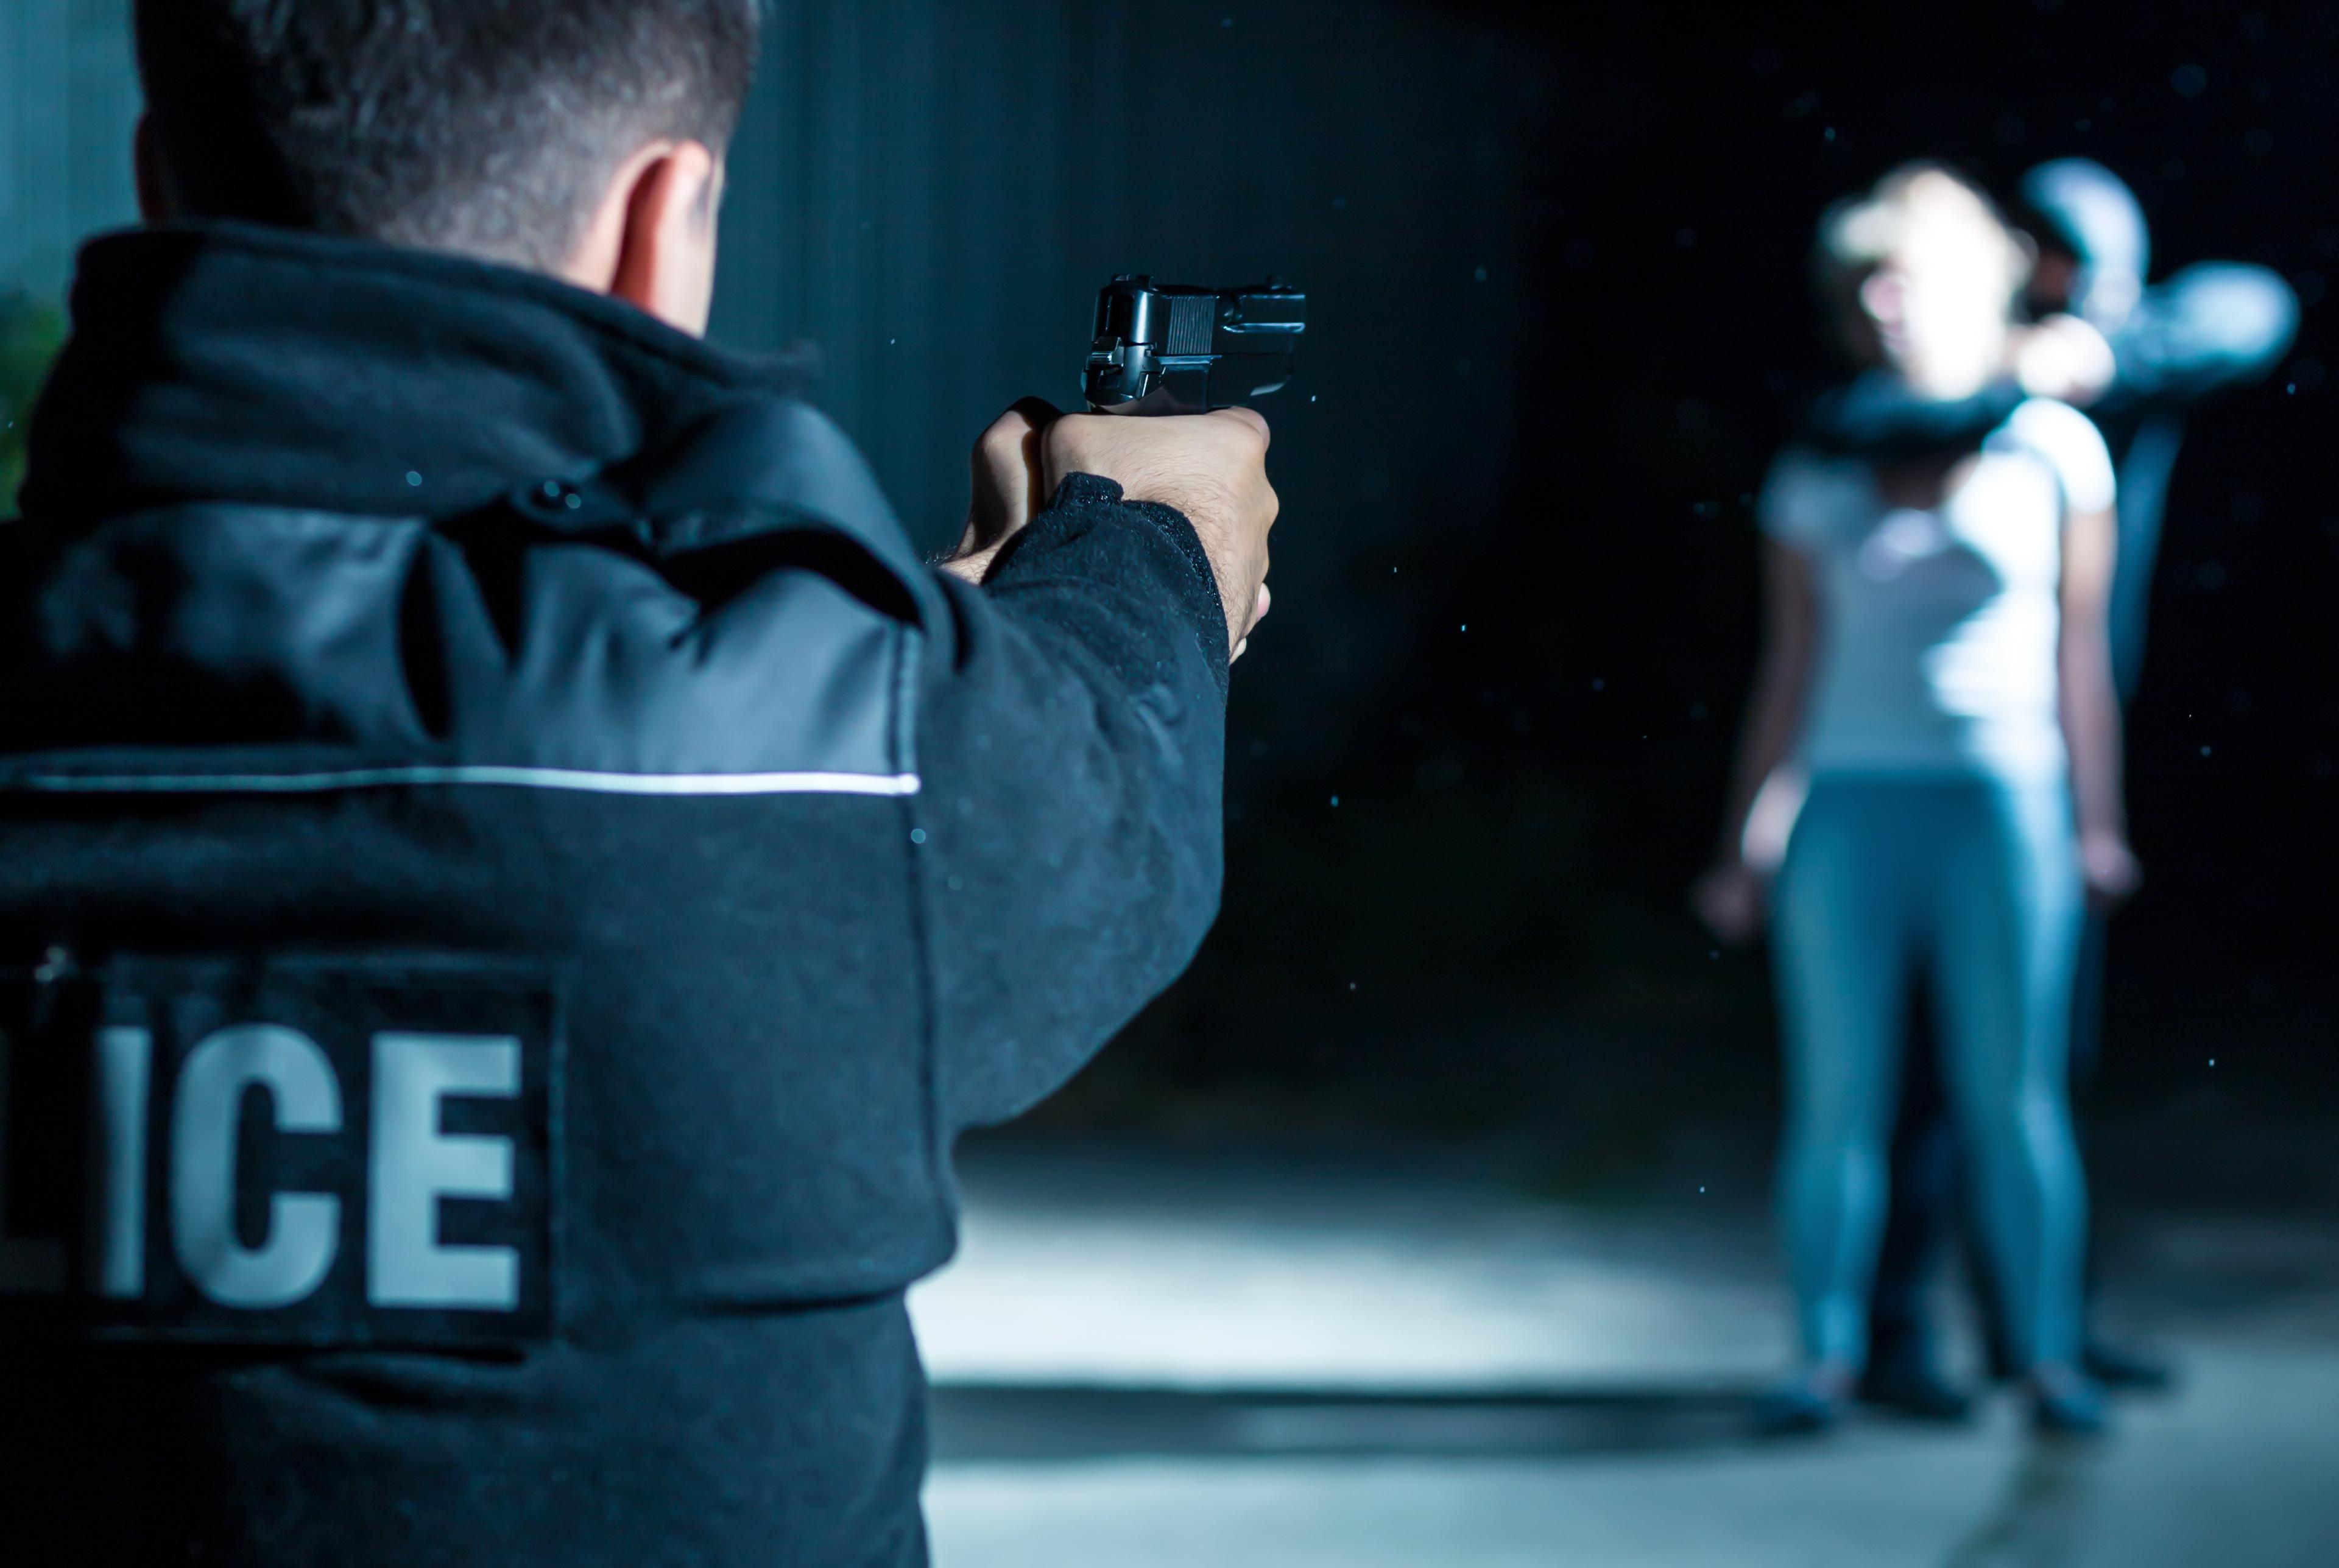 Authorities Rescue UPS Workers Taken Hostage In New Jersey Shooting